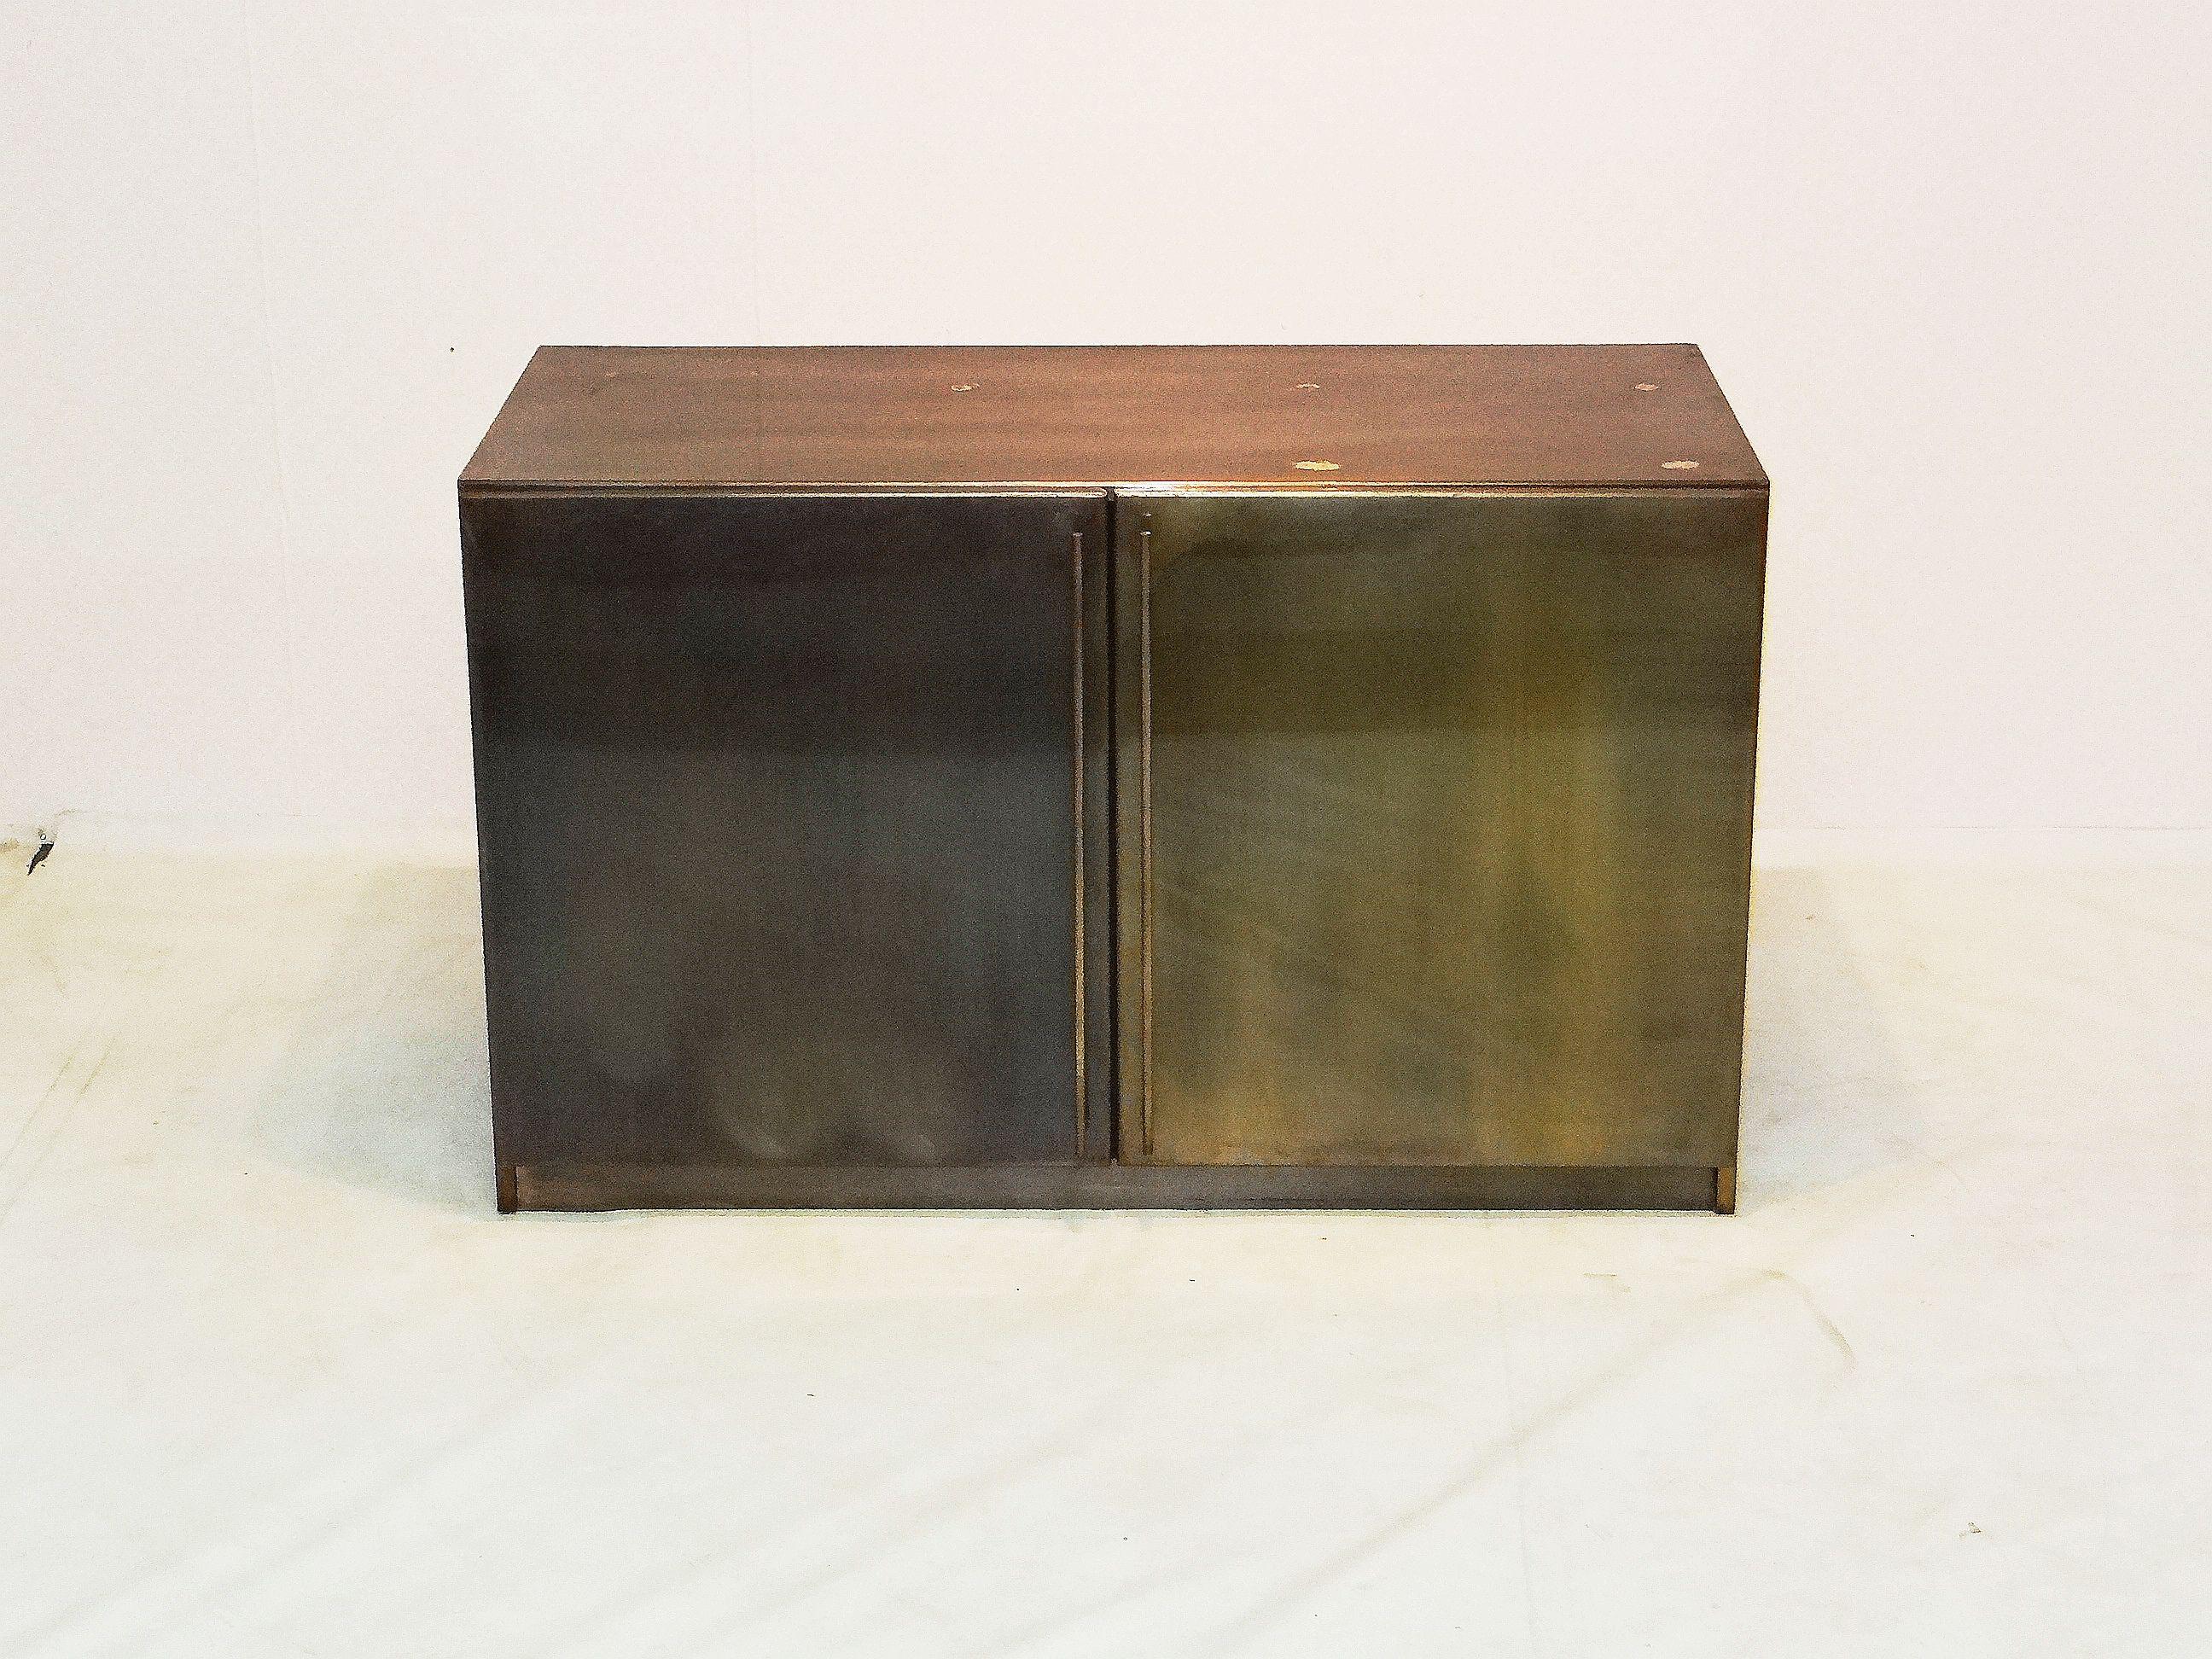 Steel bronz cabinet by Belgo chrome